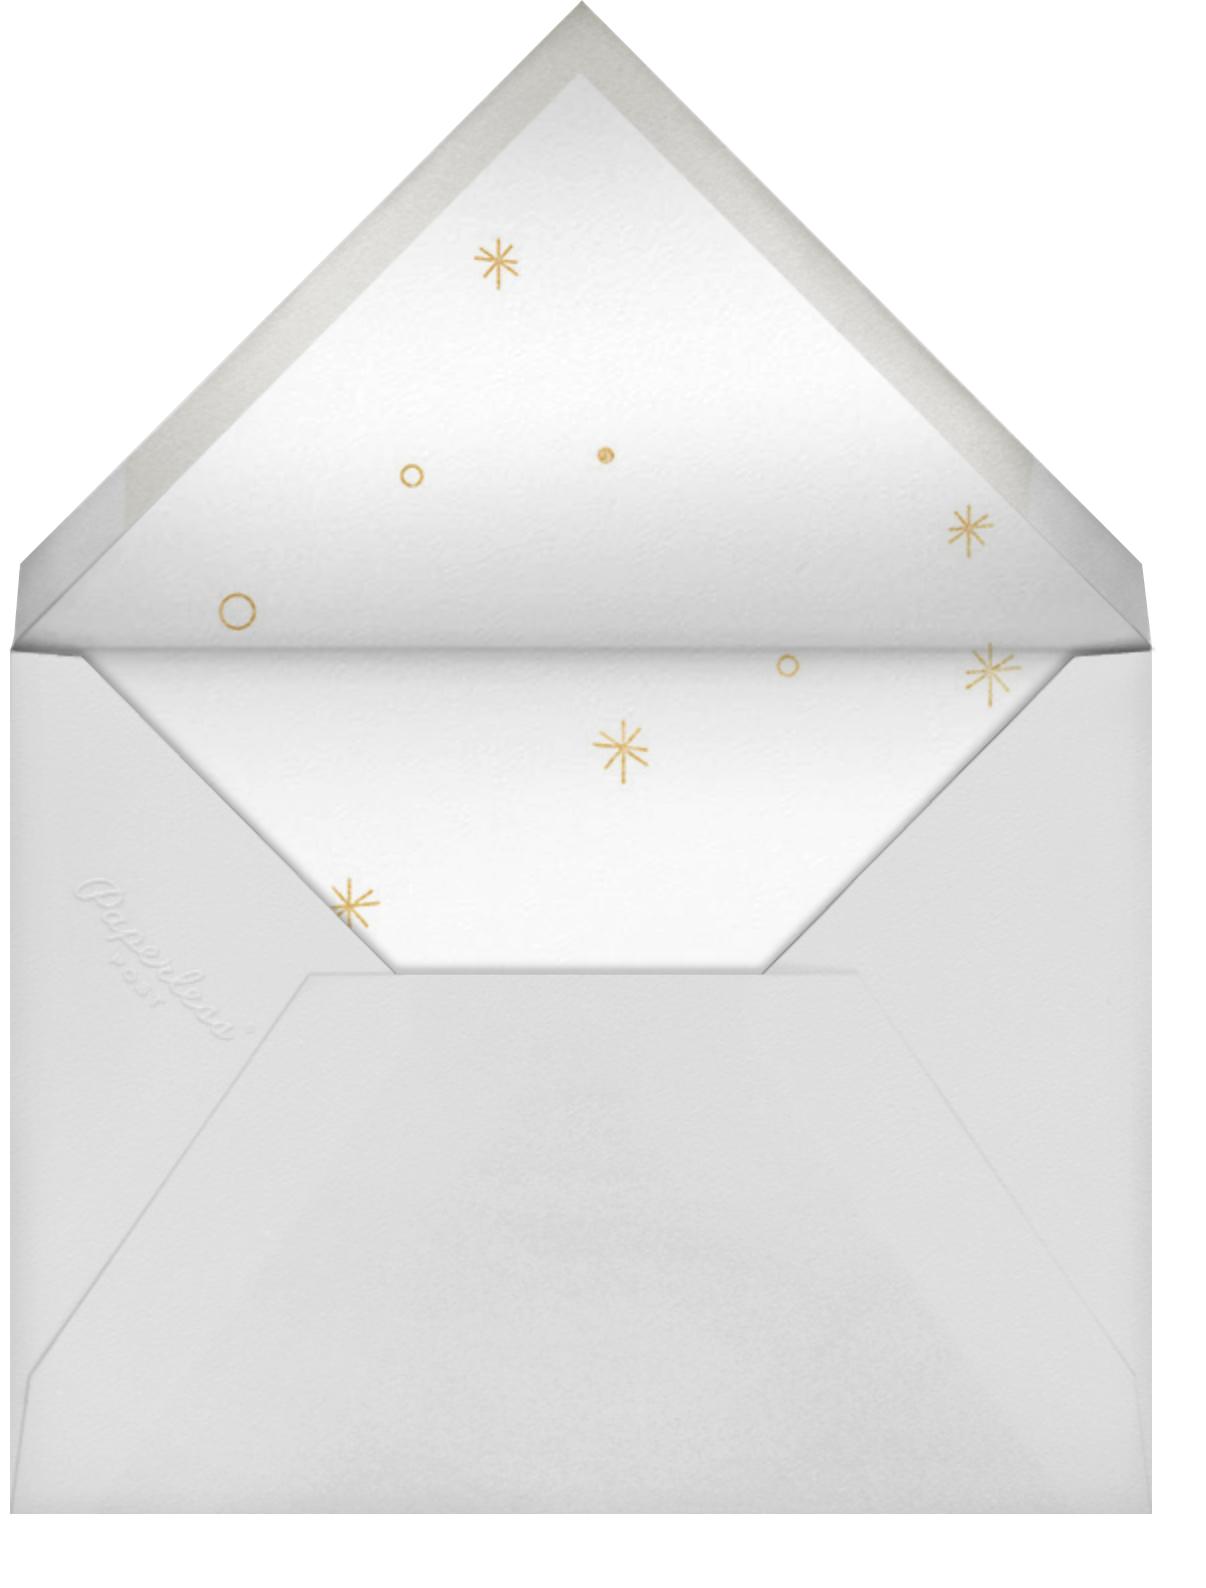 A Waste of an Invitation - Derek Blasberg - Cocktail party - envelope back